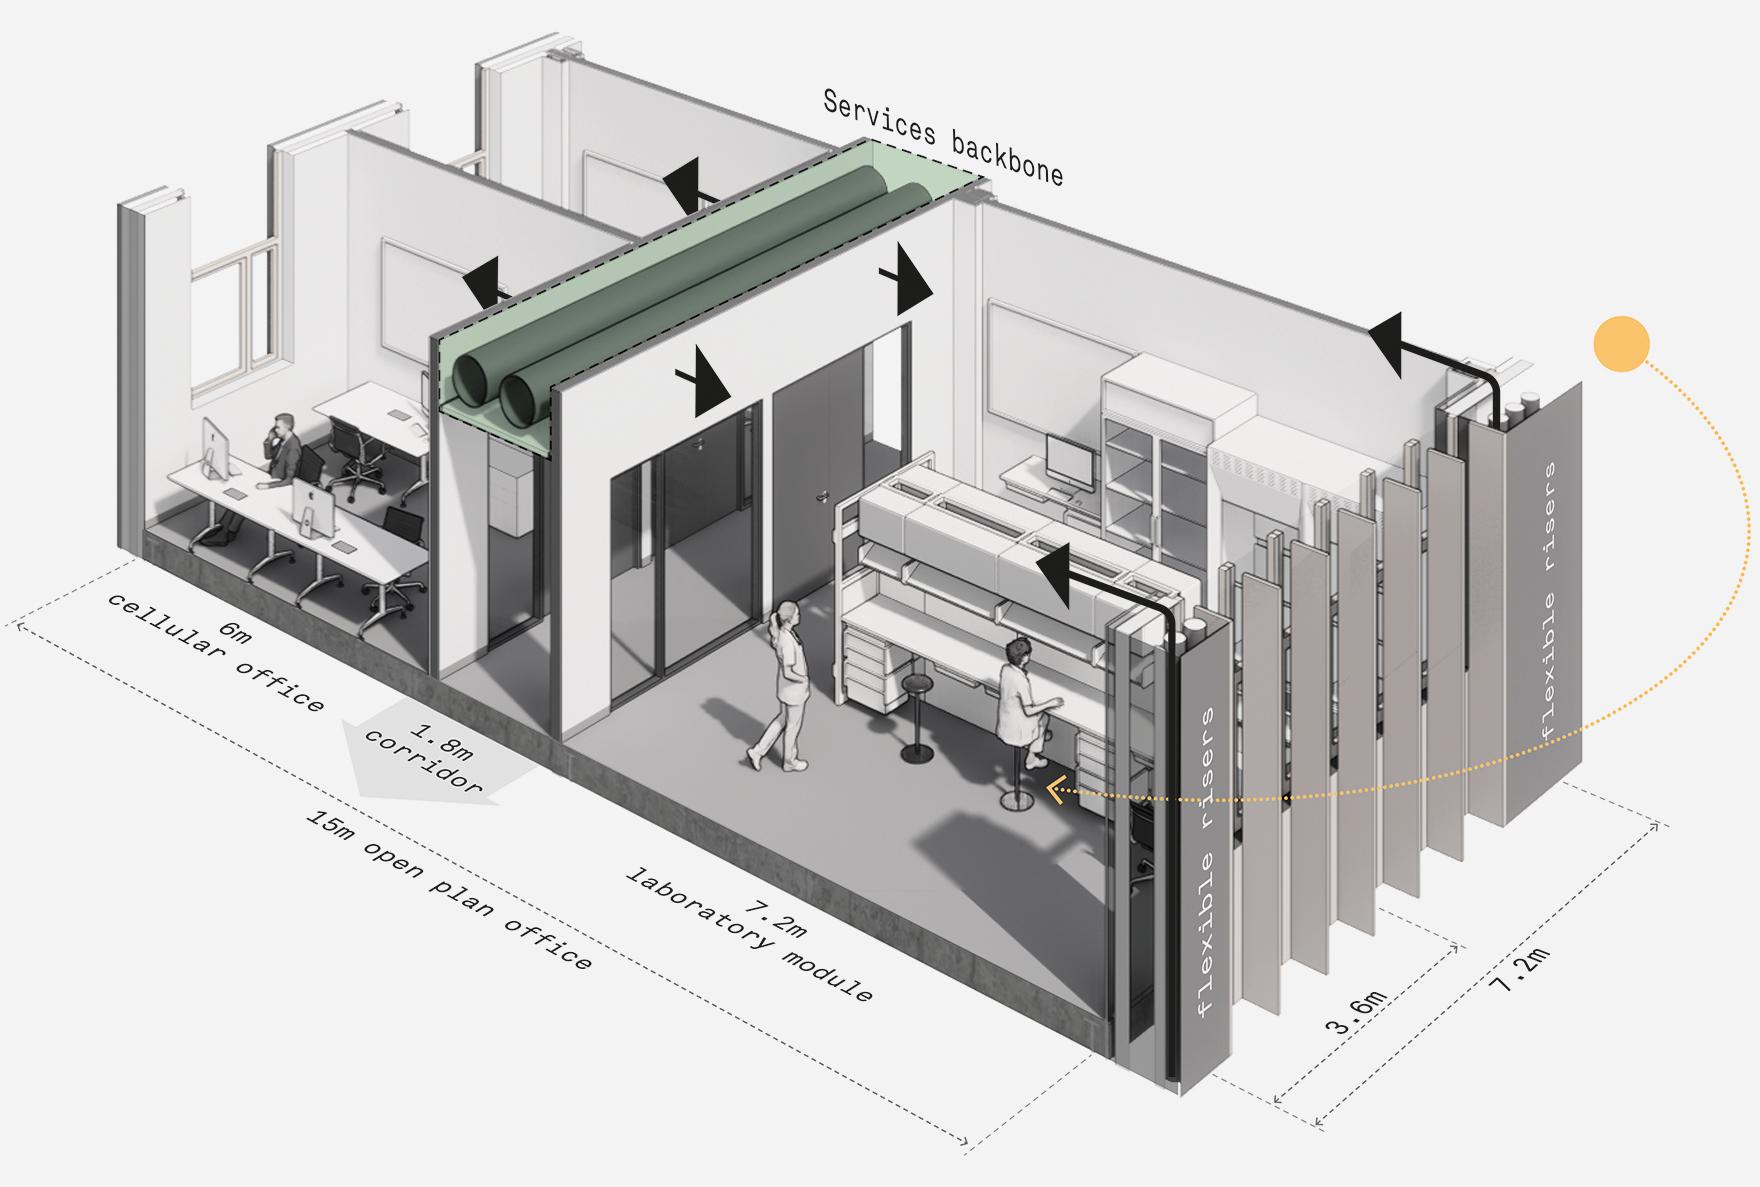 Menai Science Park Innovation Centre Laboratory And Workspaces L